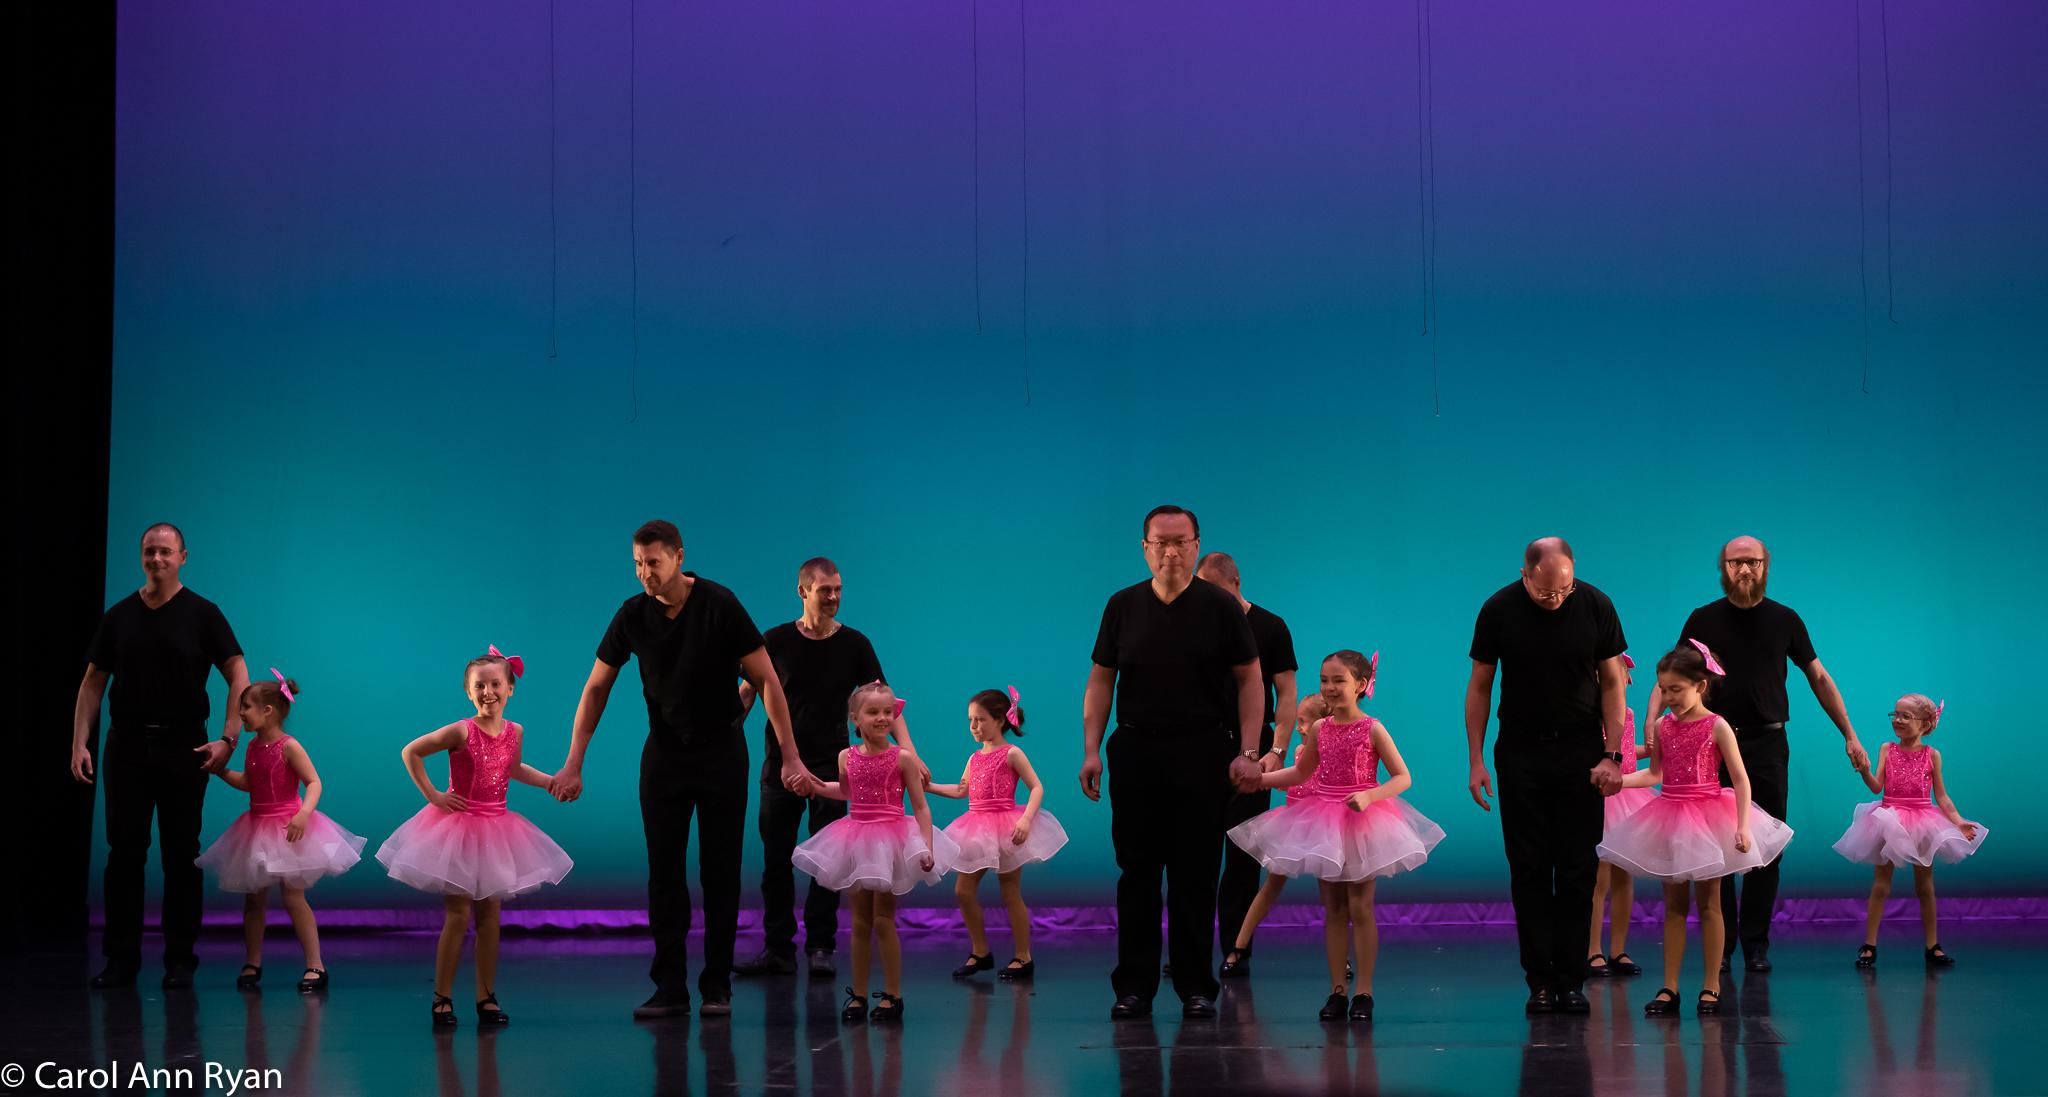 2019_06_05-Dance Recital 36006-1.jpg